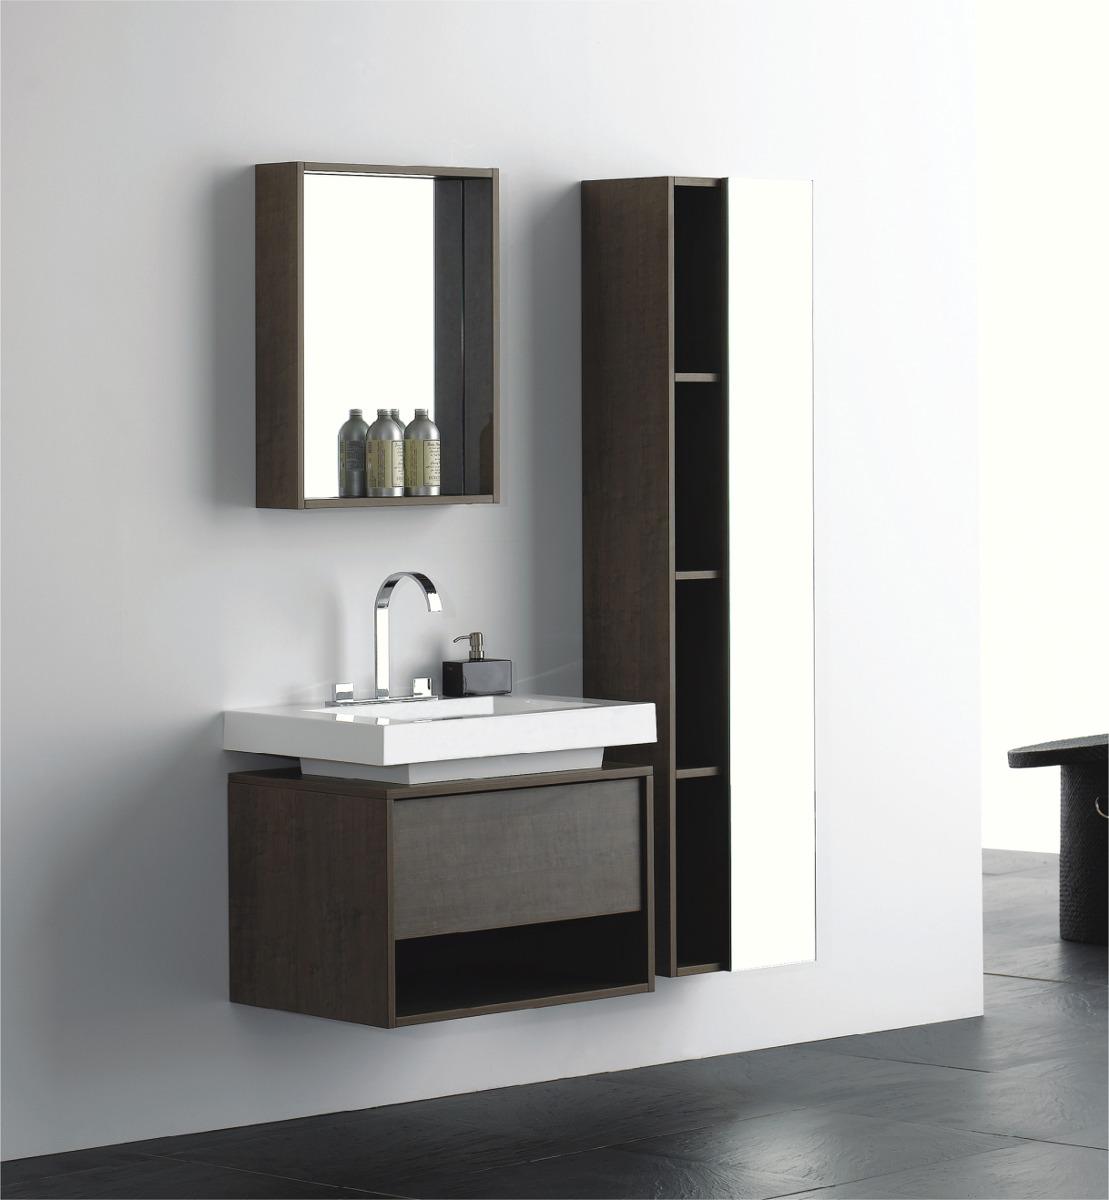 Kit Gabinete Banheiro Modelo Squadre Ks704 04 Peças R$ 2.584  #58514A 1109 1200